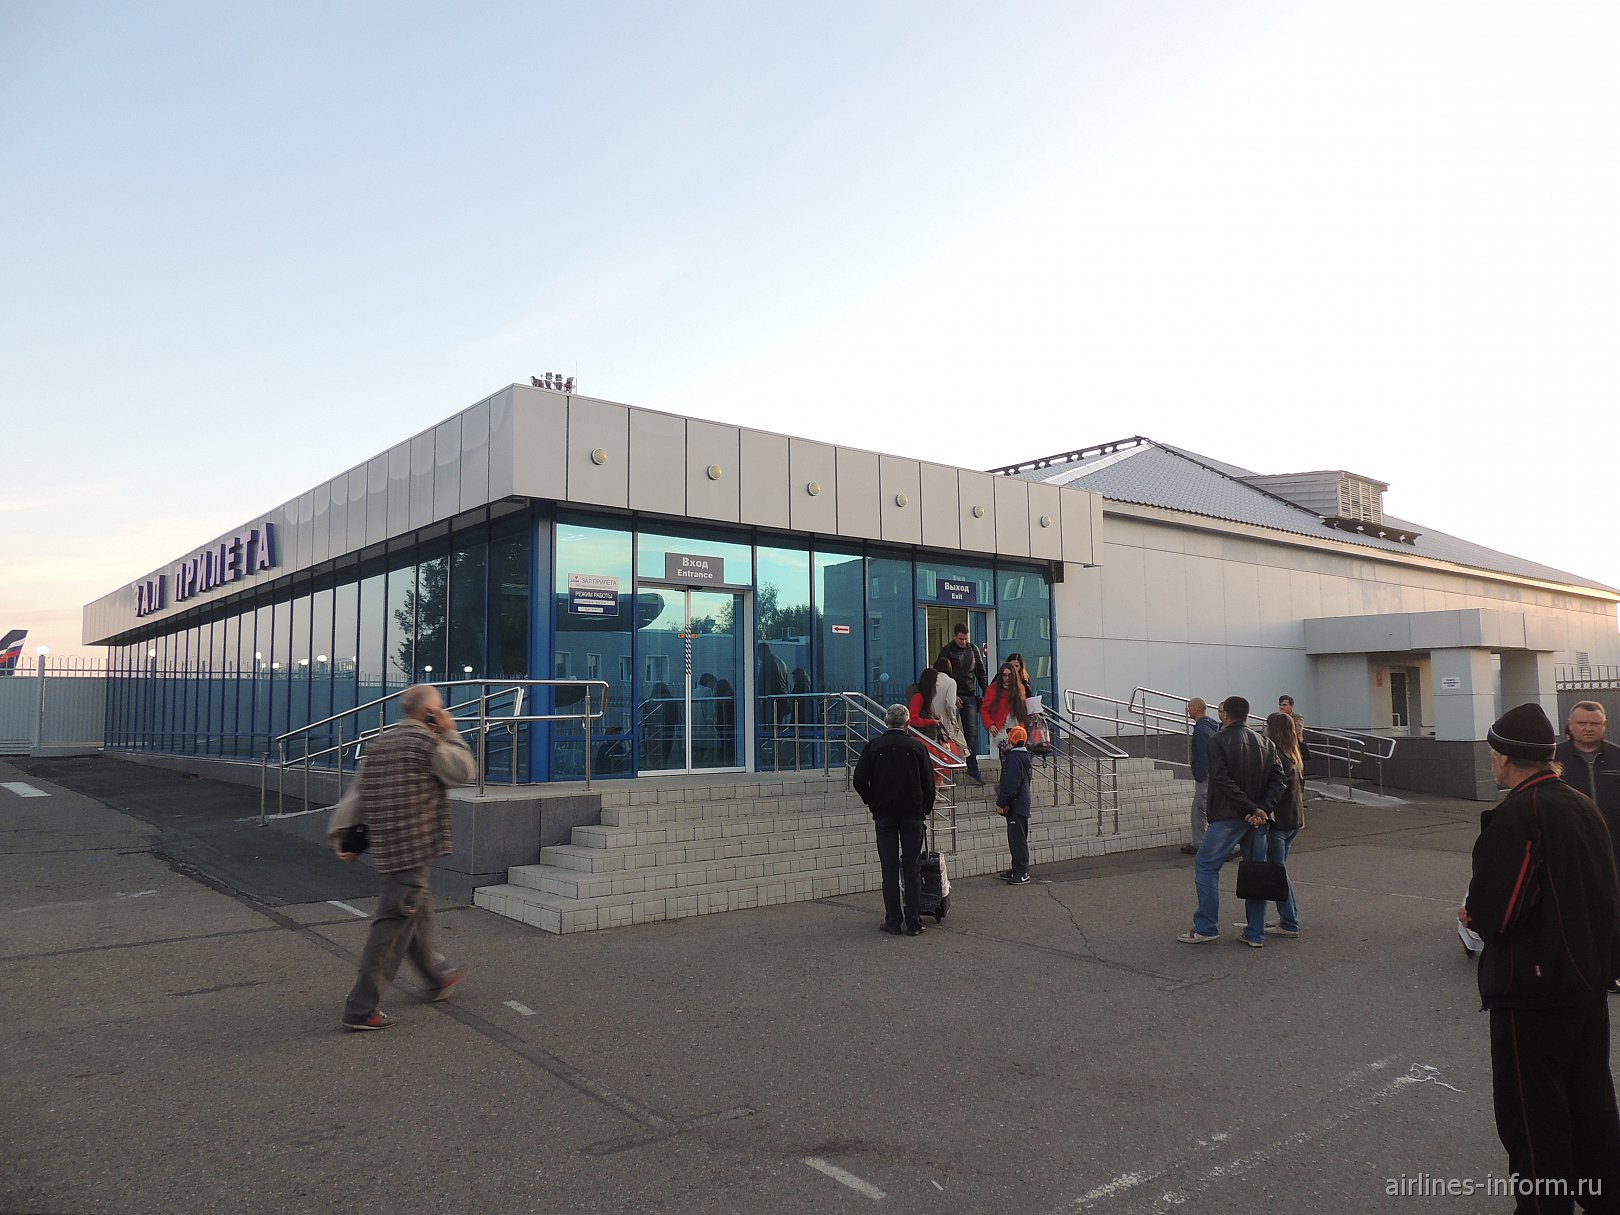 Зал прилета в аэропорту Барнаул